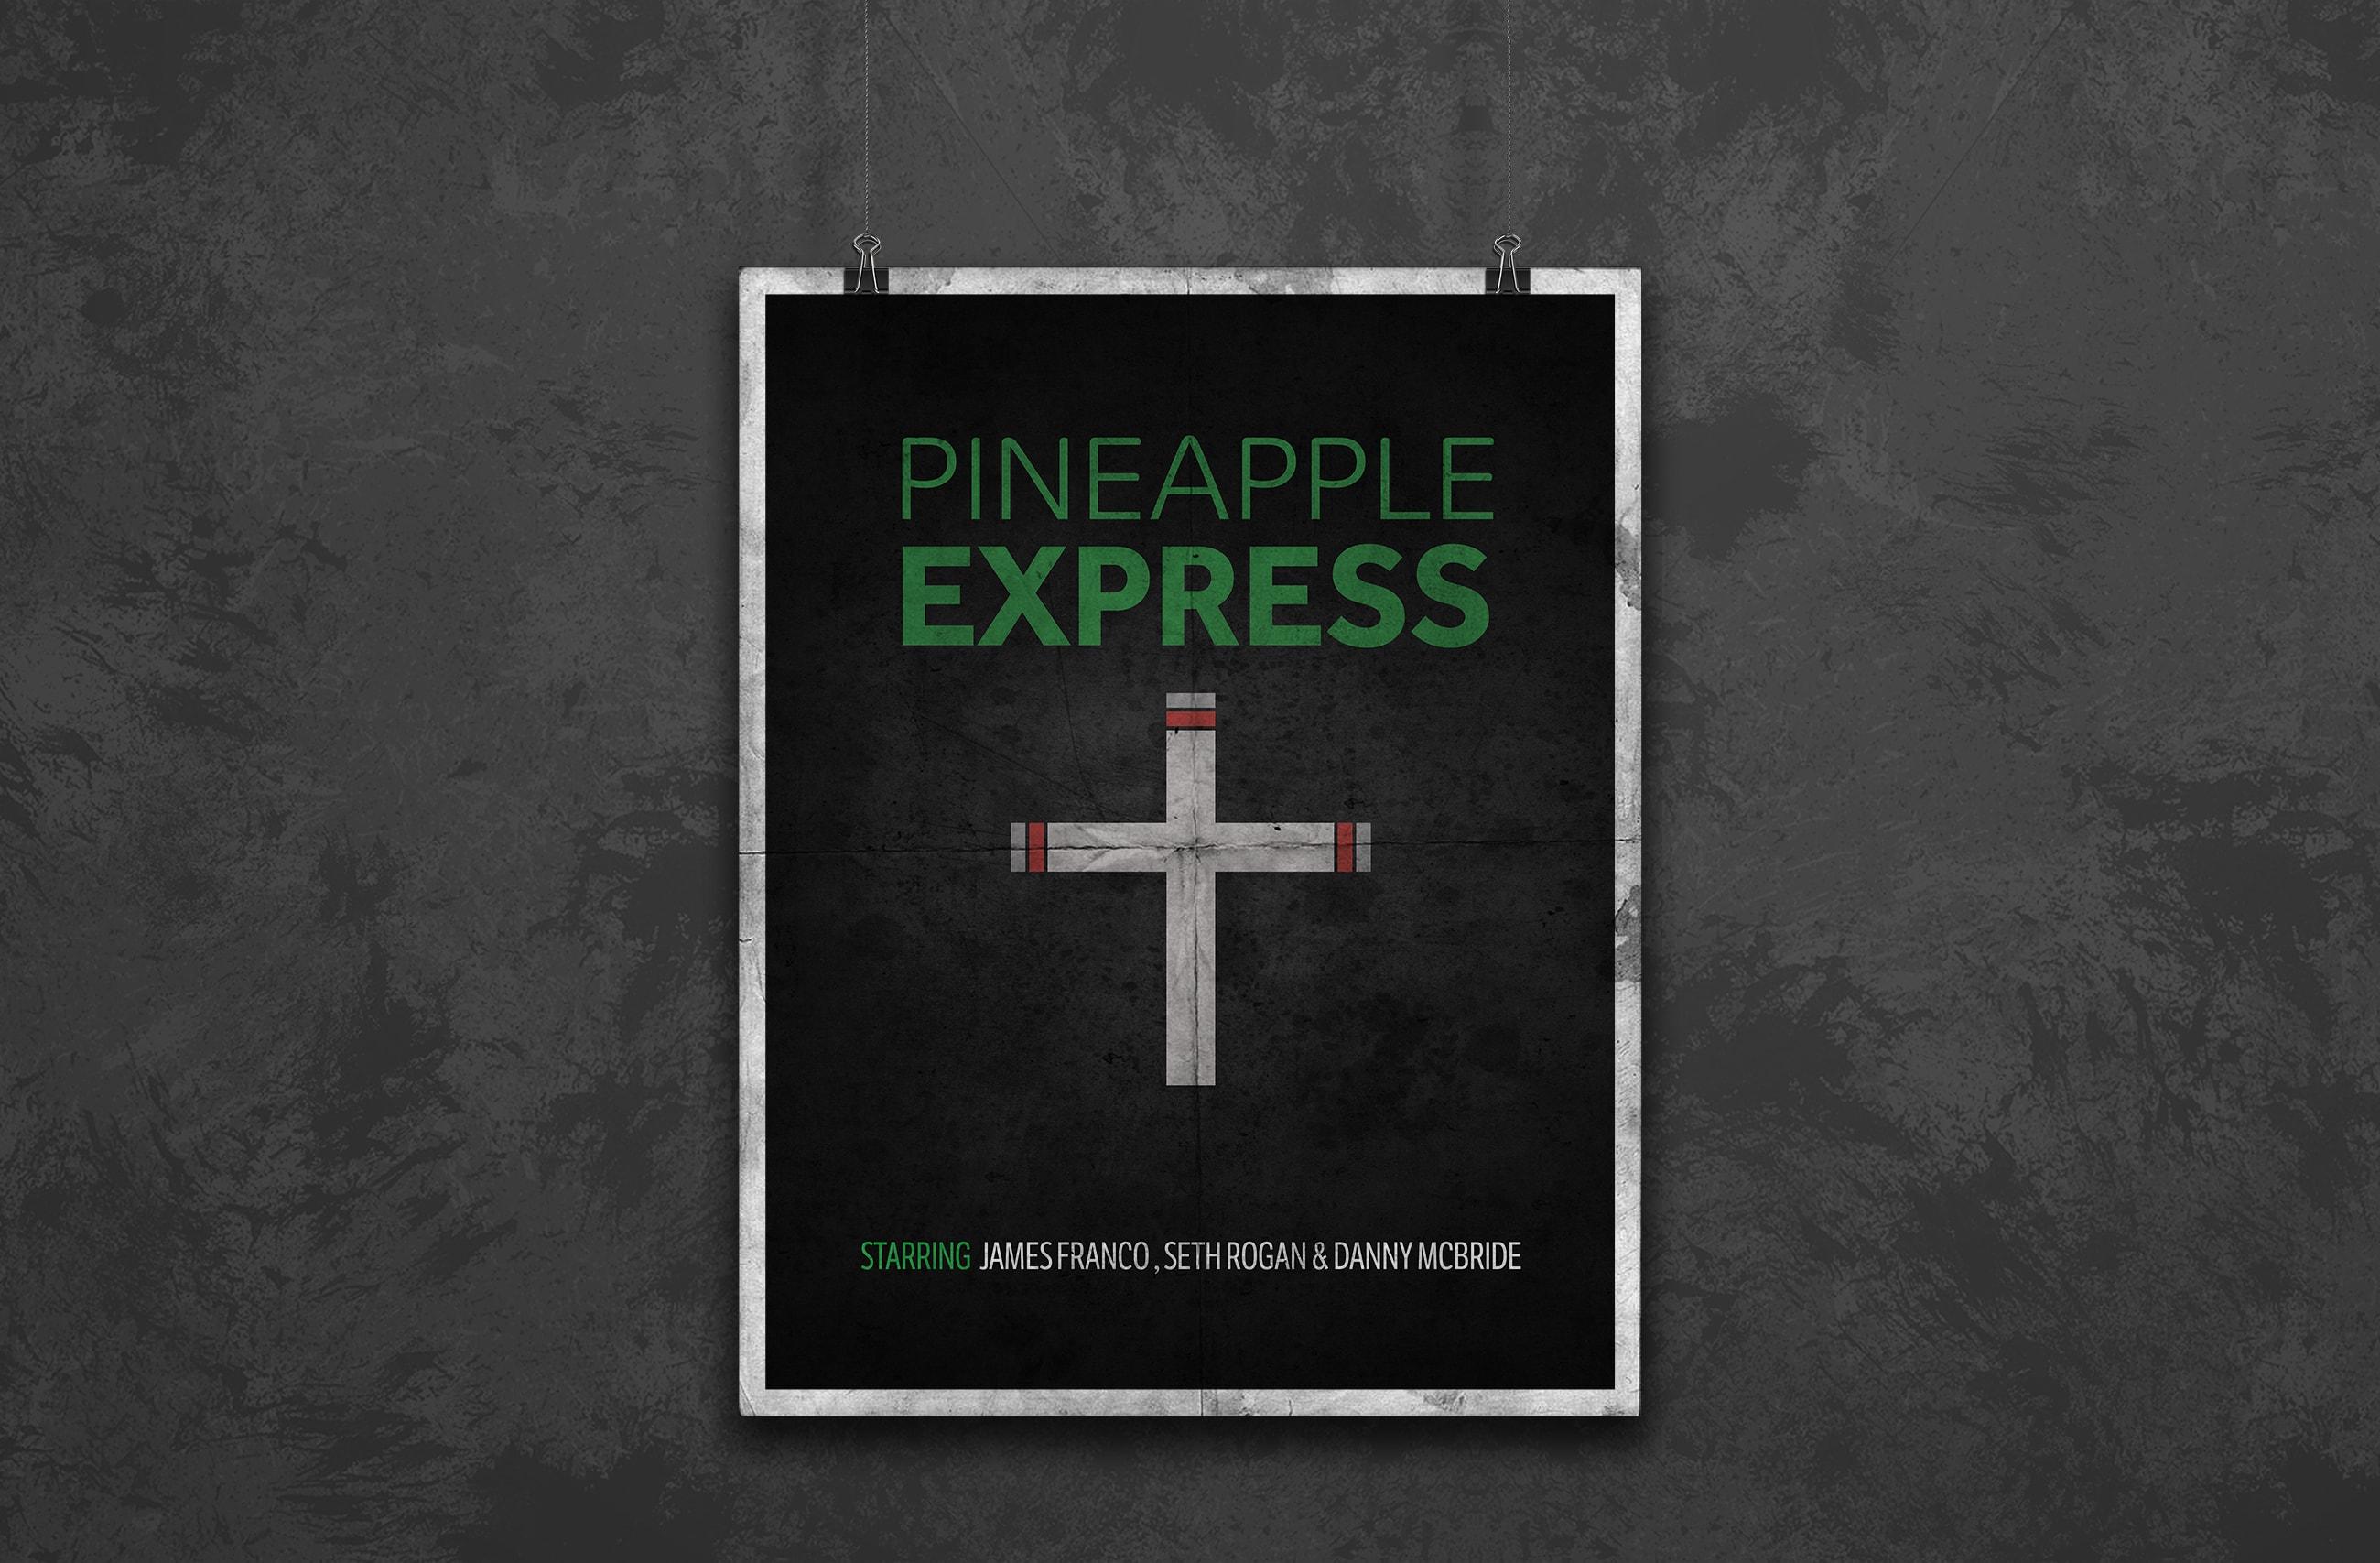 pineapple express minimal movie poster design